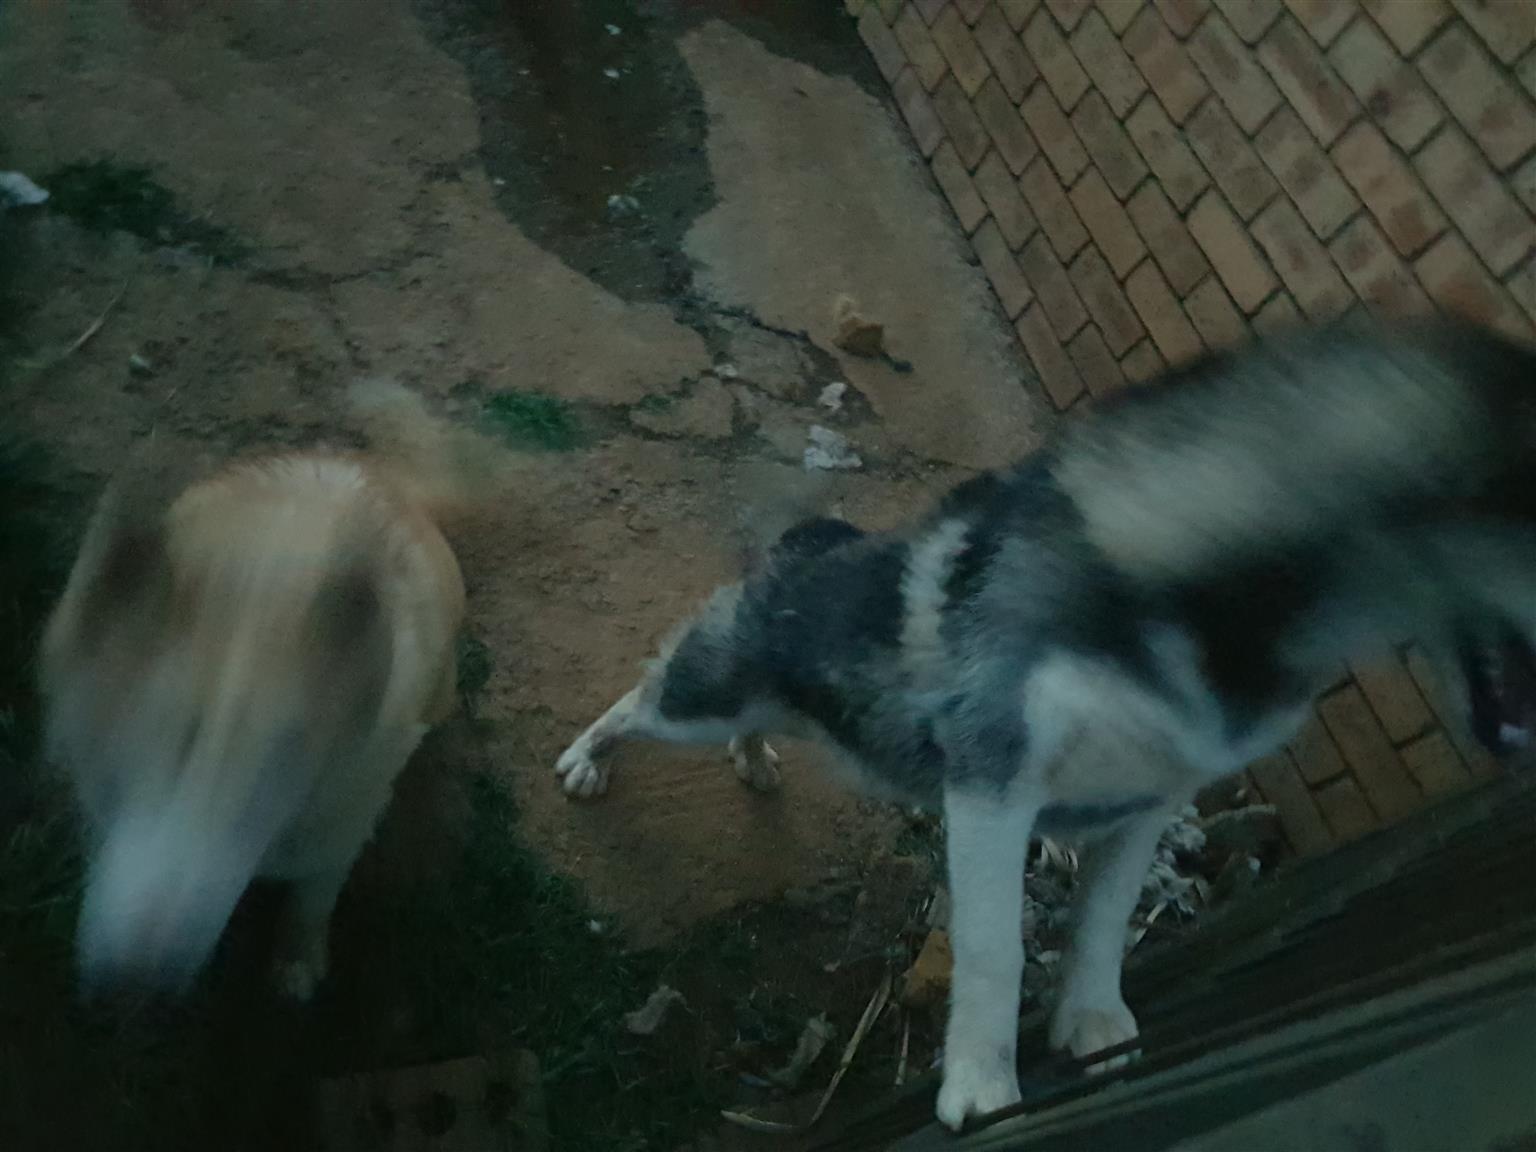 Selling siberian huskies